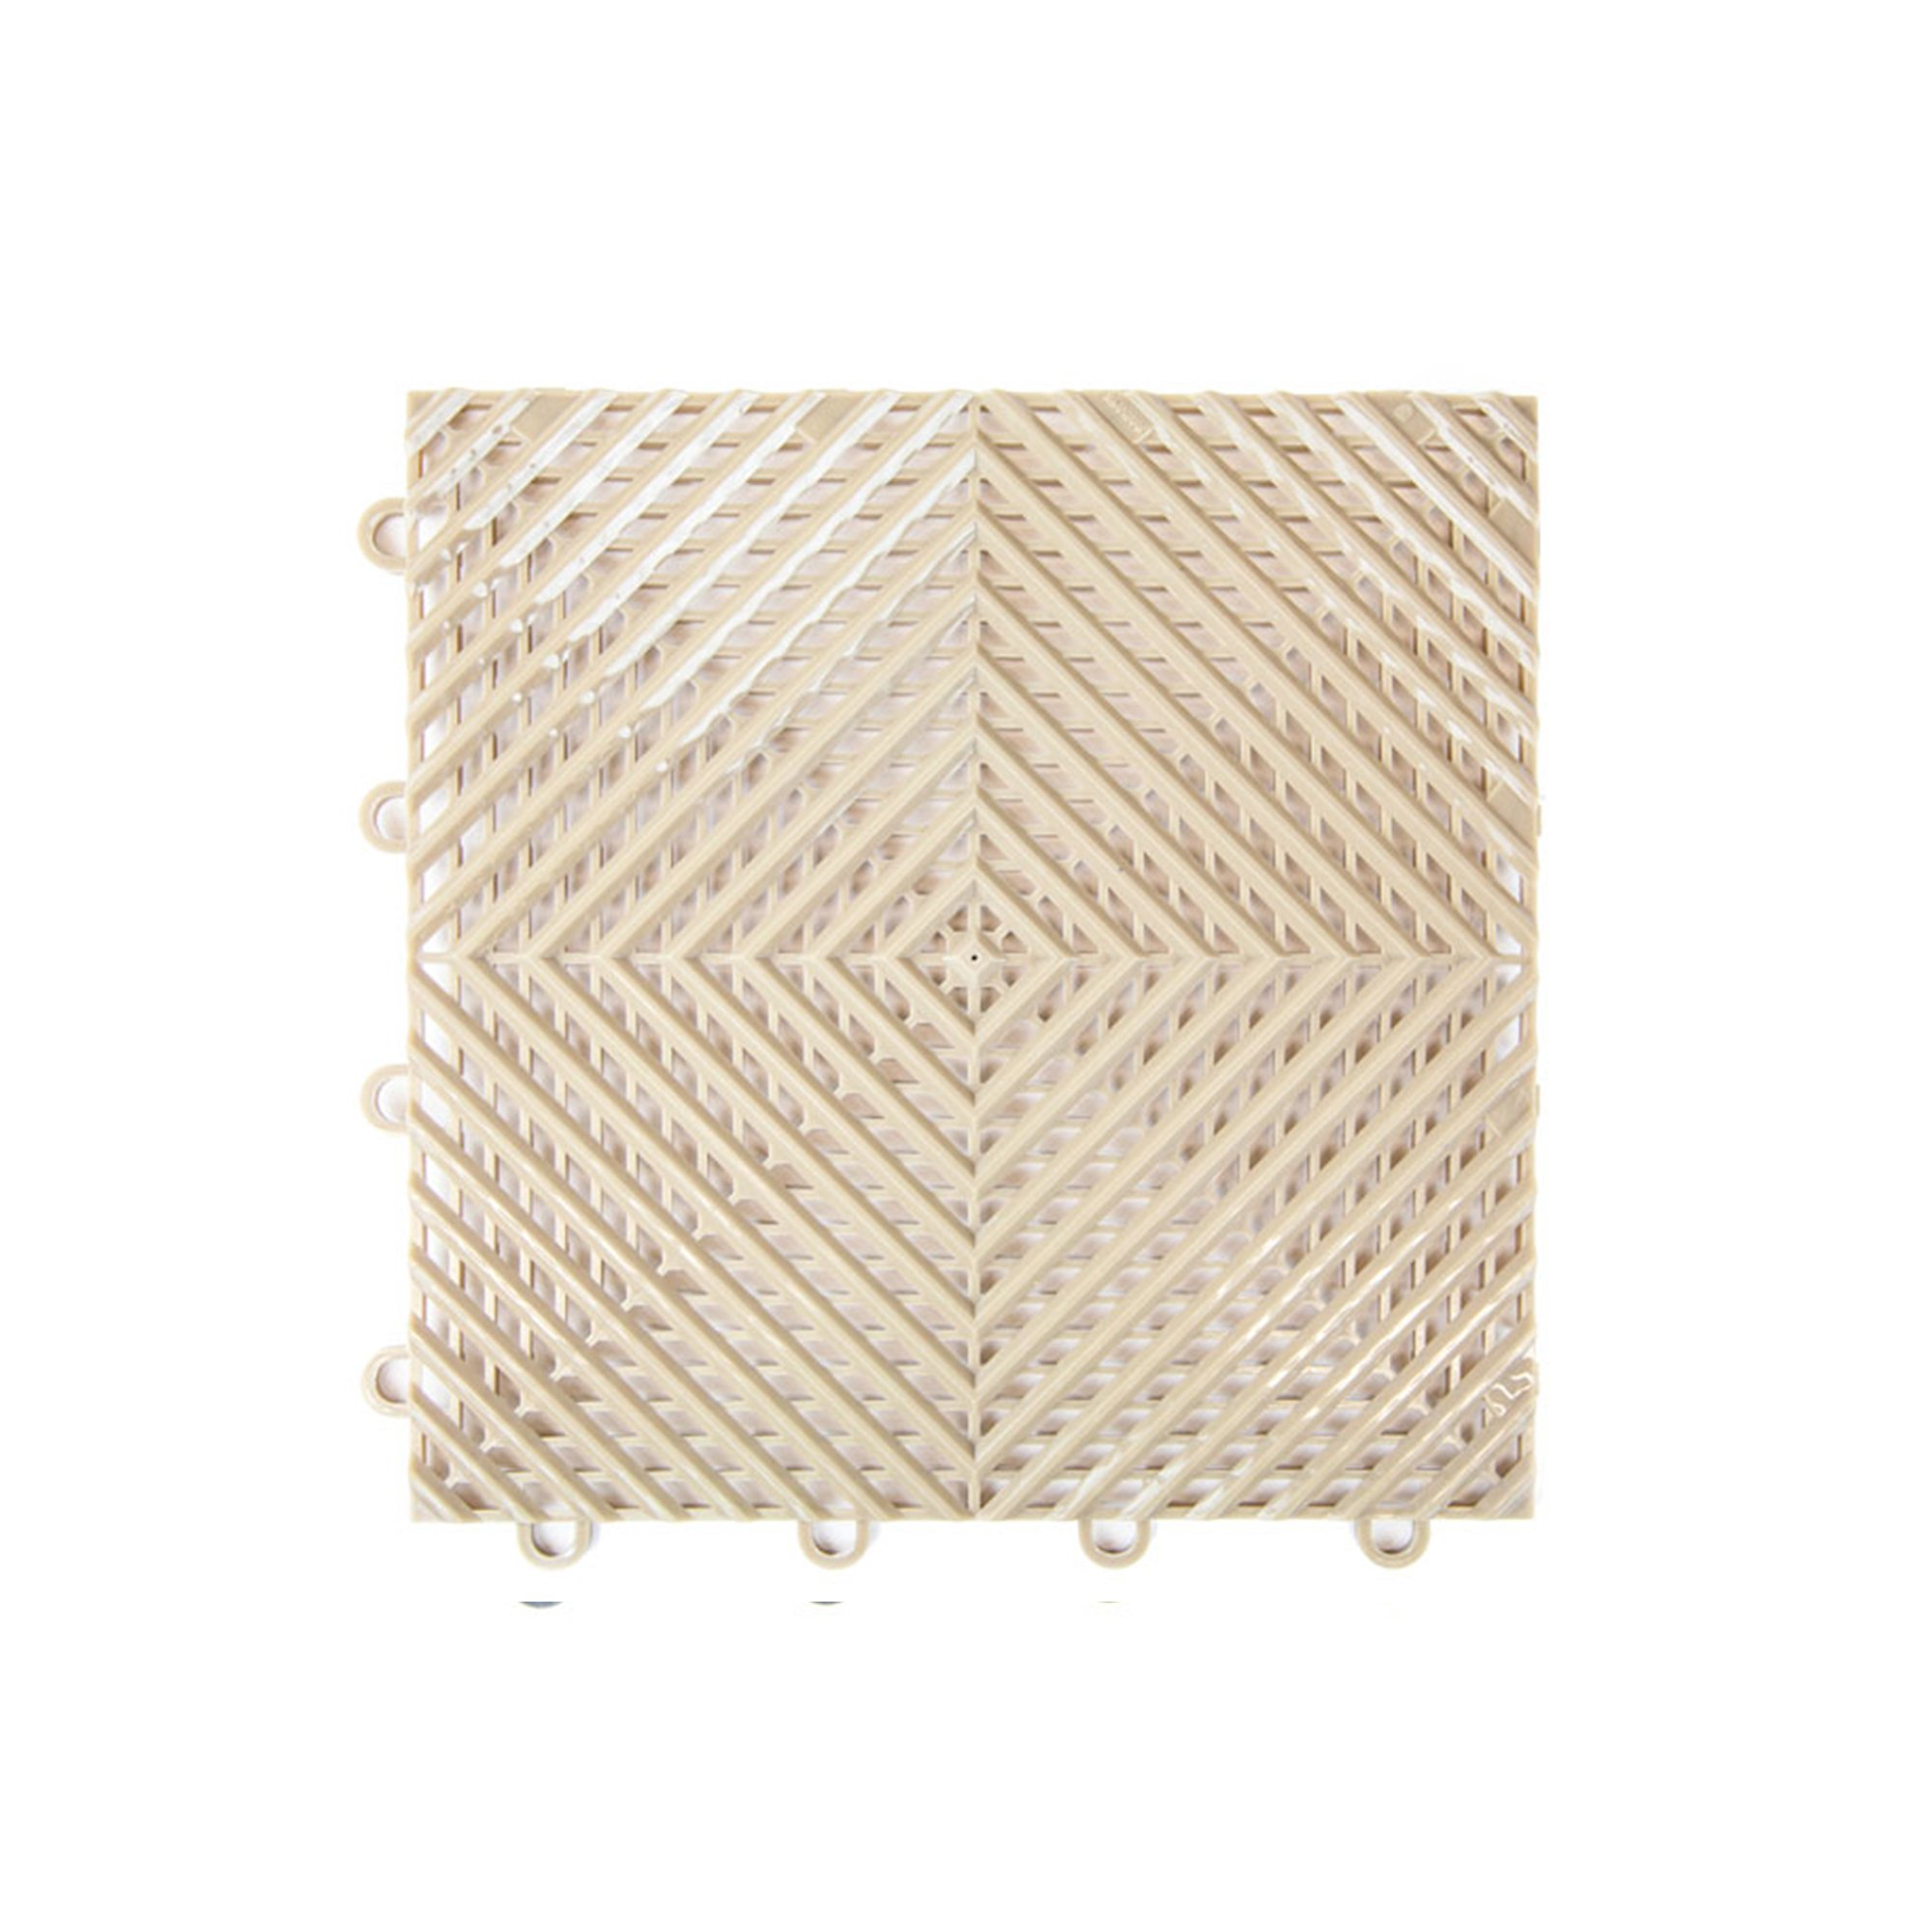 IncStores Vented Nitro Garage Tiles 12''x12'' Interlocking Garage Flooring (Sahara Sand - 52-12''x12'' Tiles)